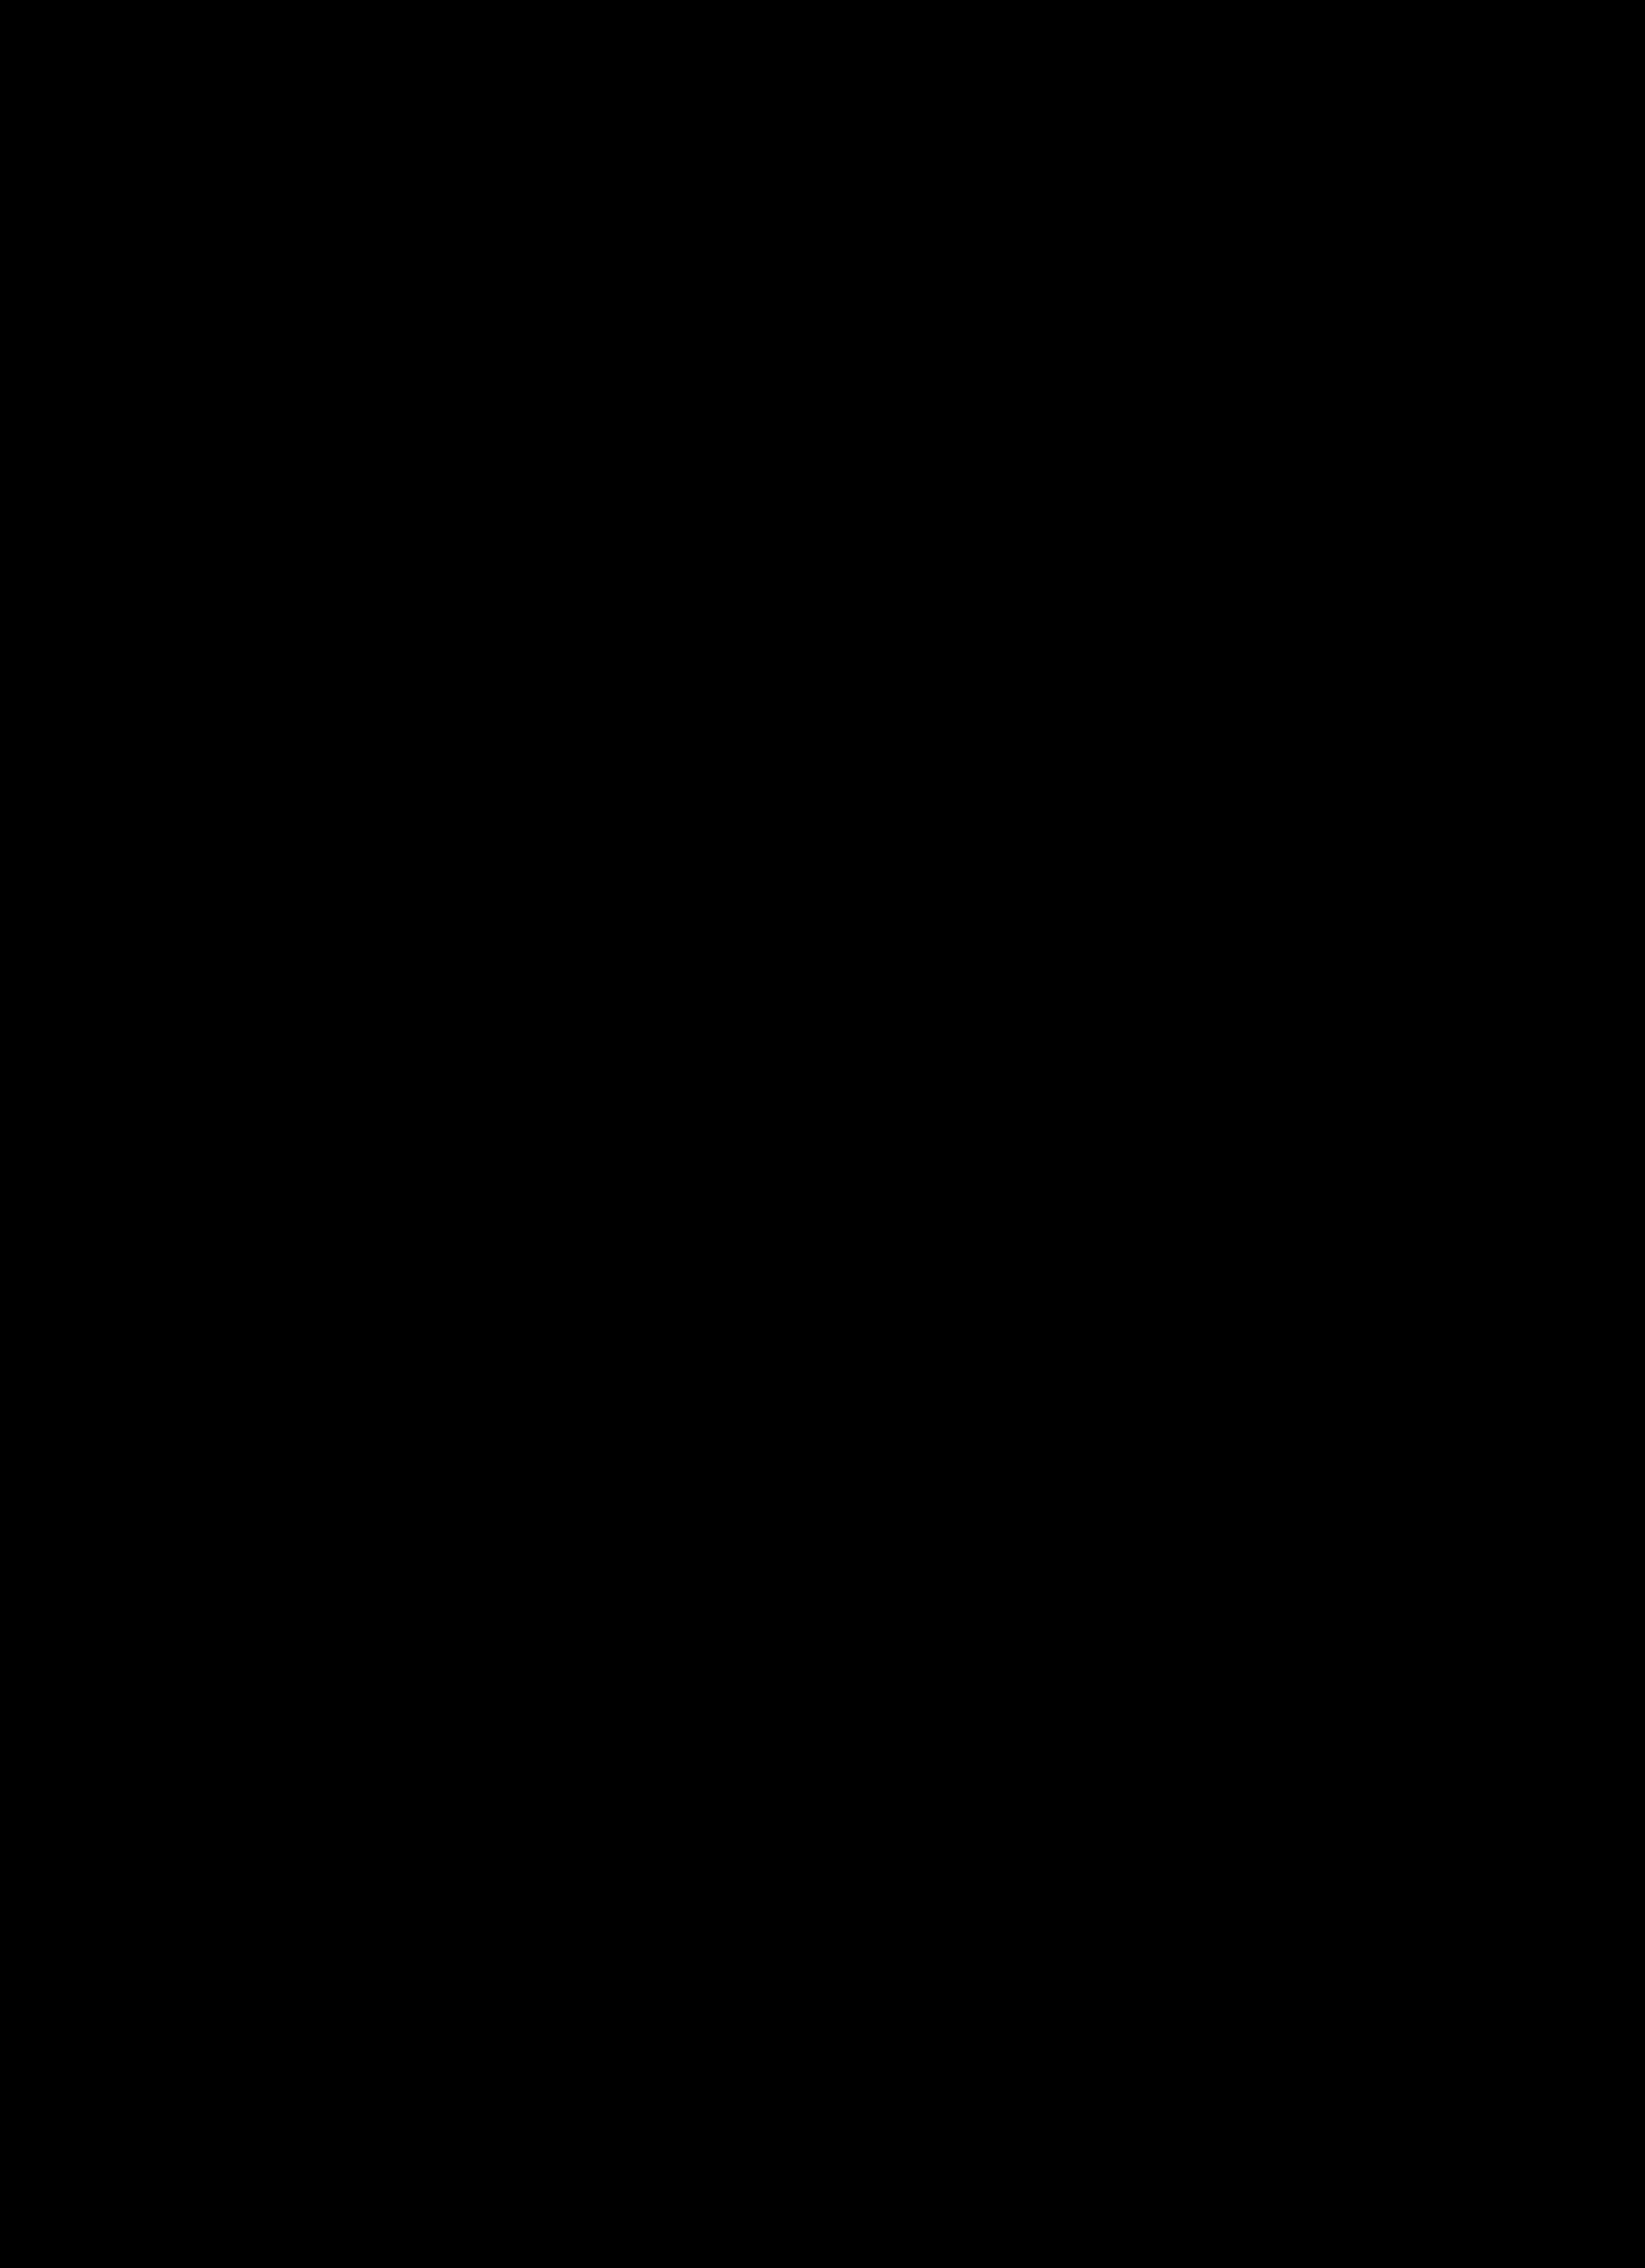 Heart frame clipart black and white stock Black And White Border Designs Group (59+) stock